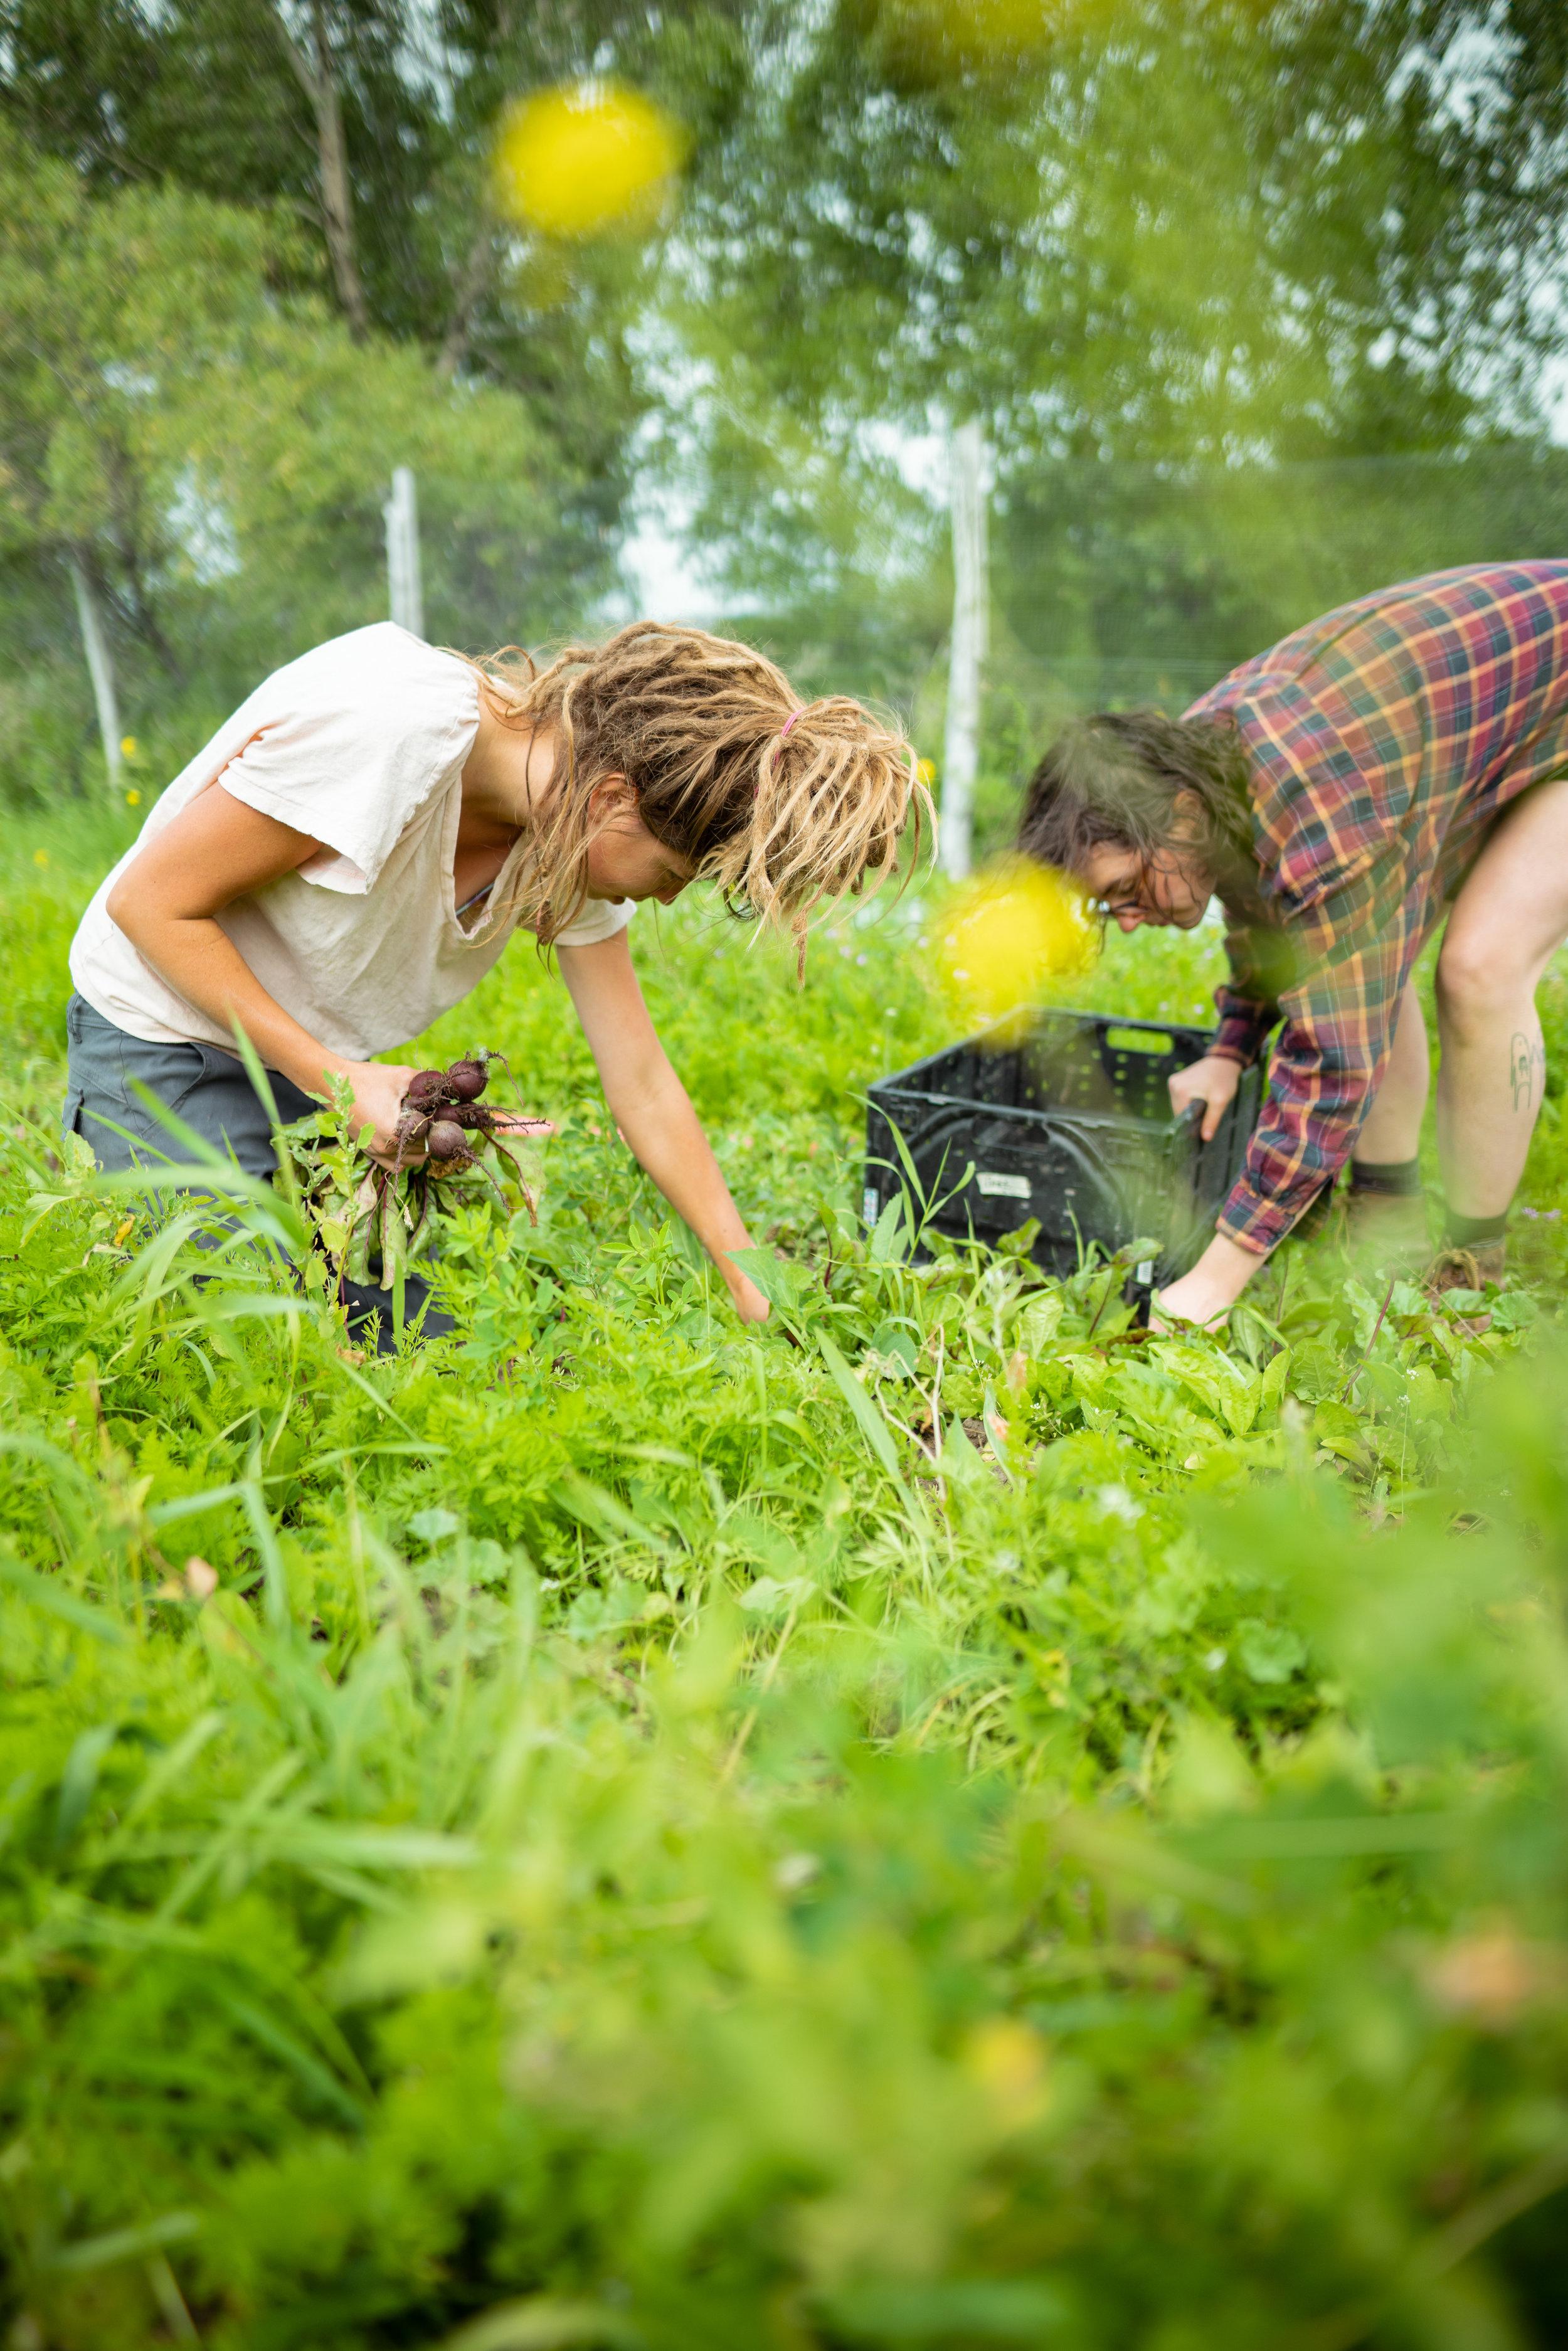 Kacy Senger picking beets at Sprig & Root Farm in Clarkston, Montana.